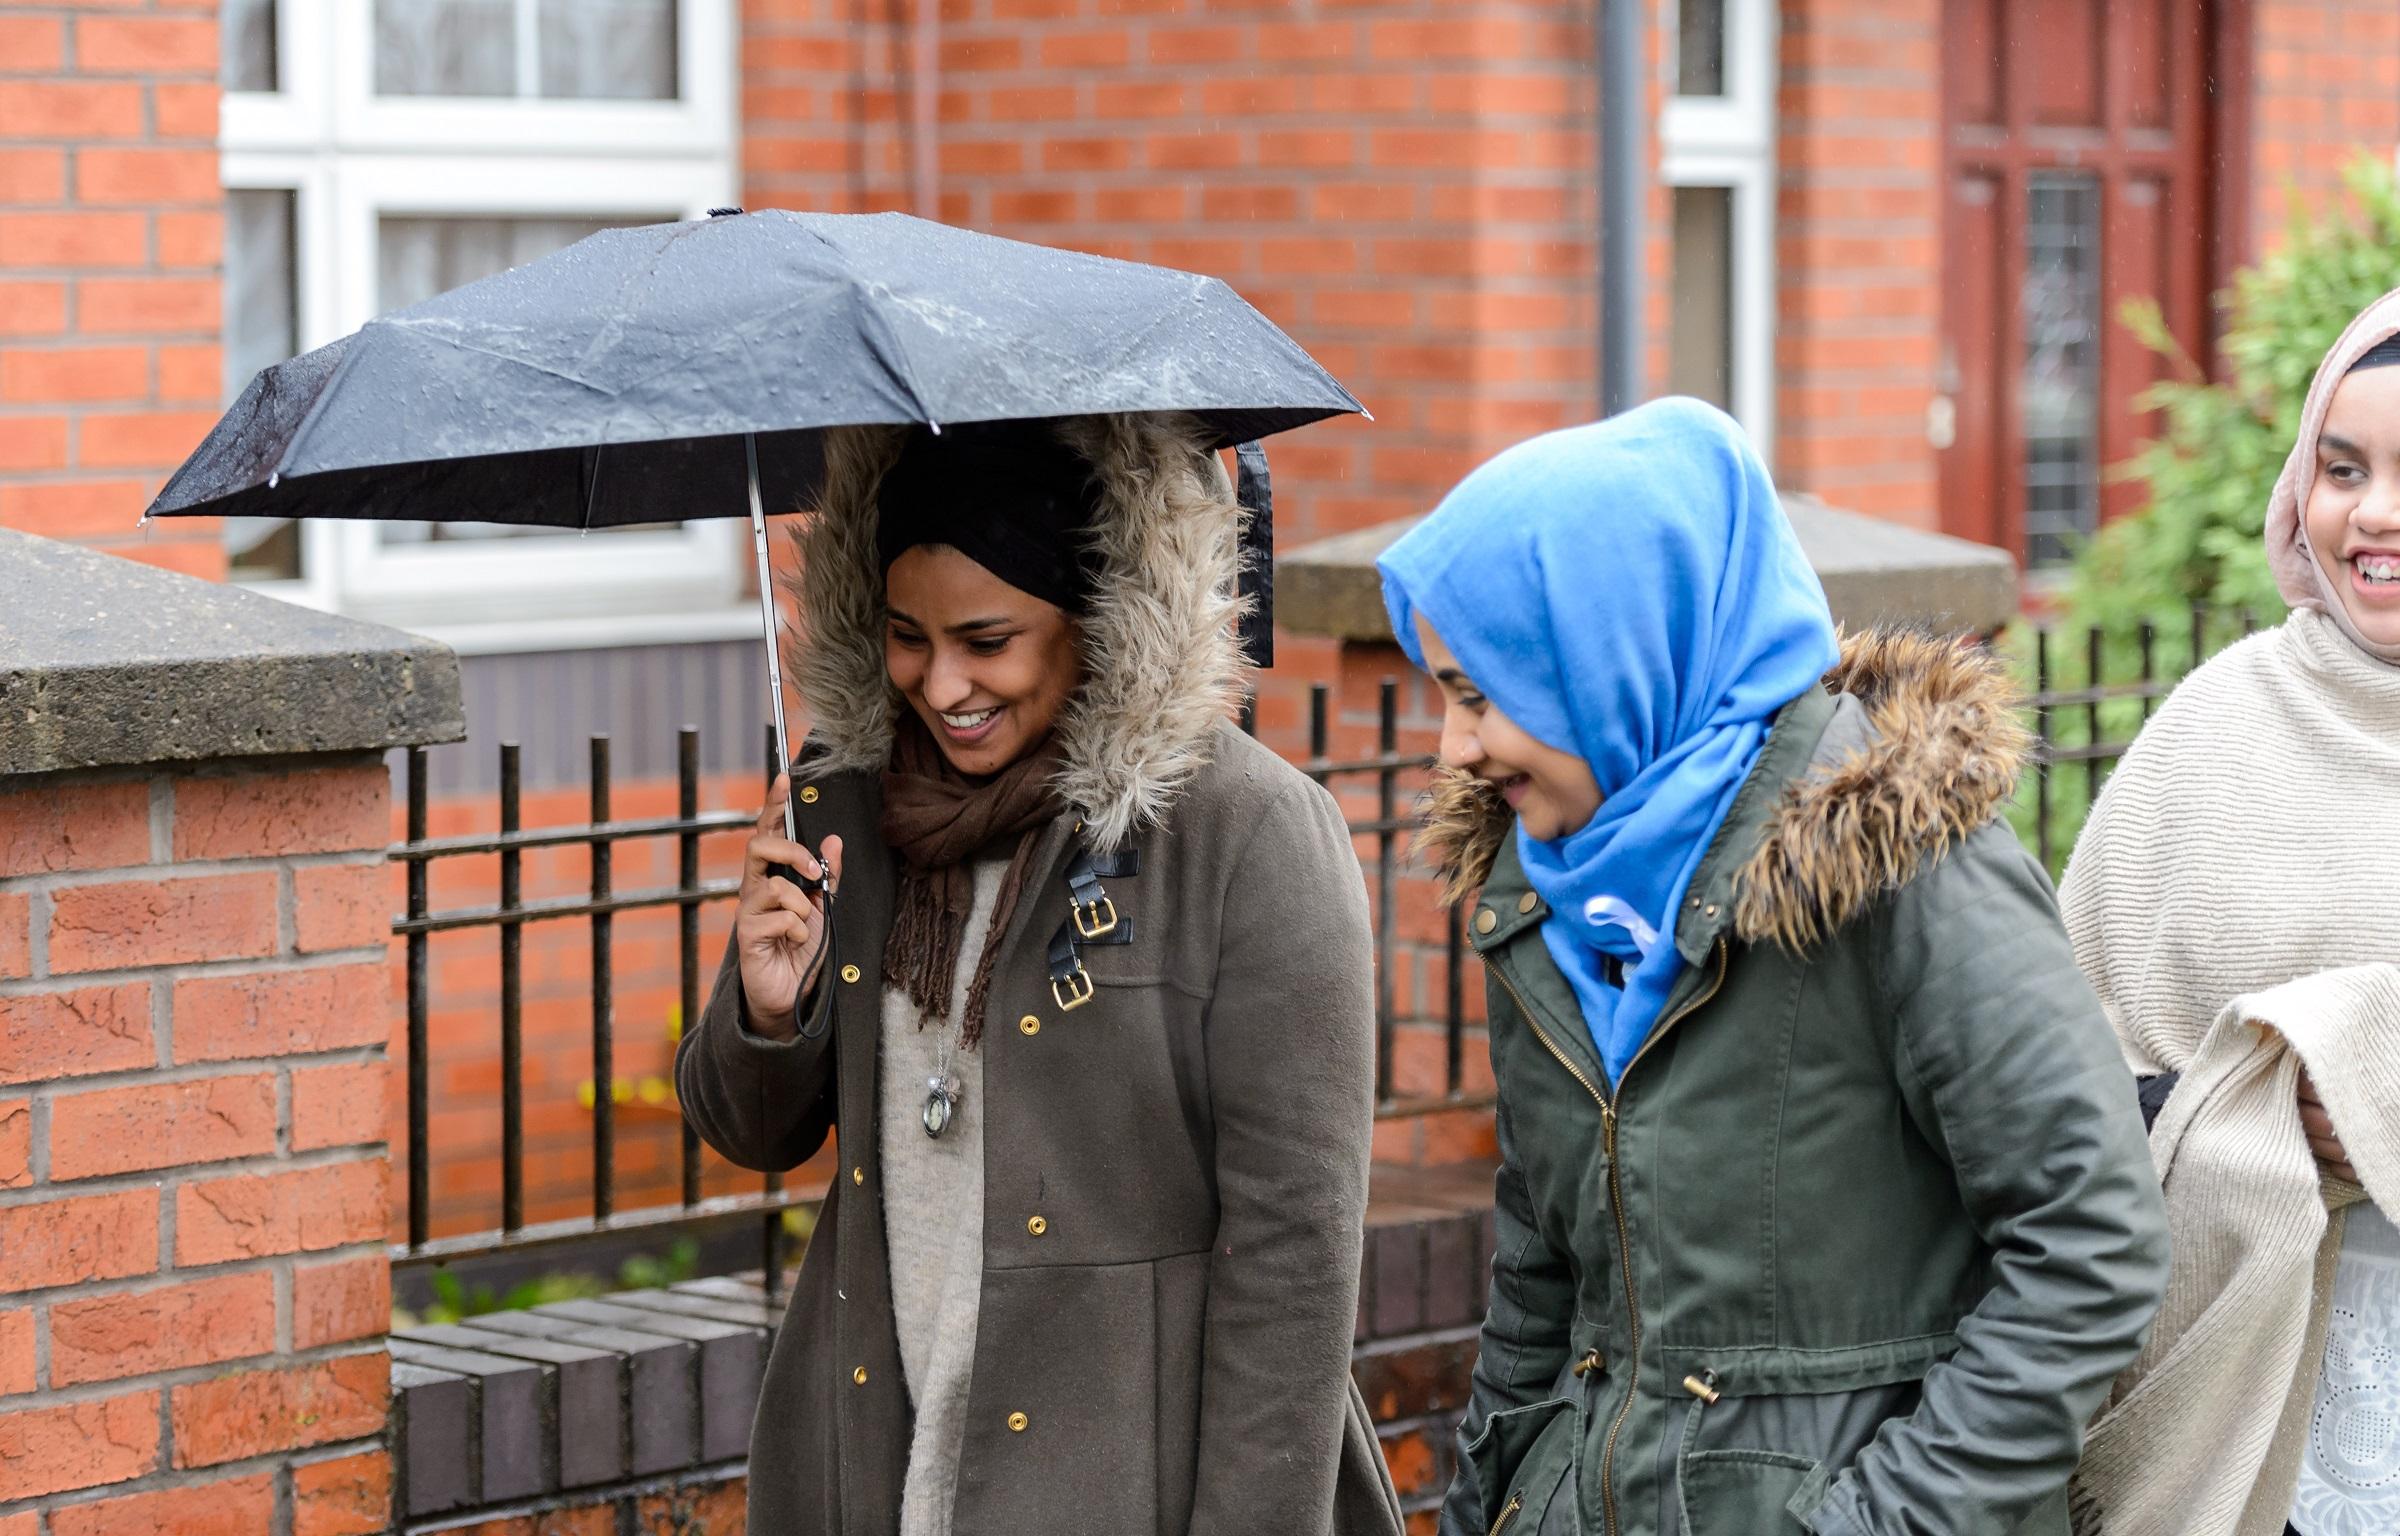 three women walking down street with umbrella